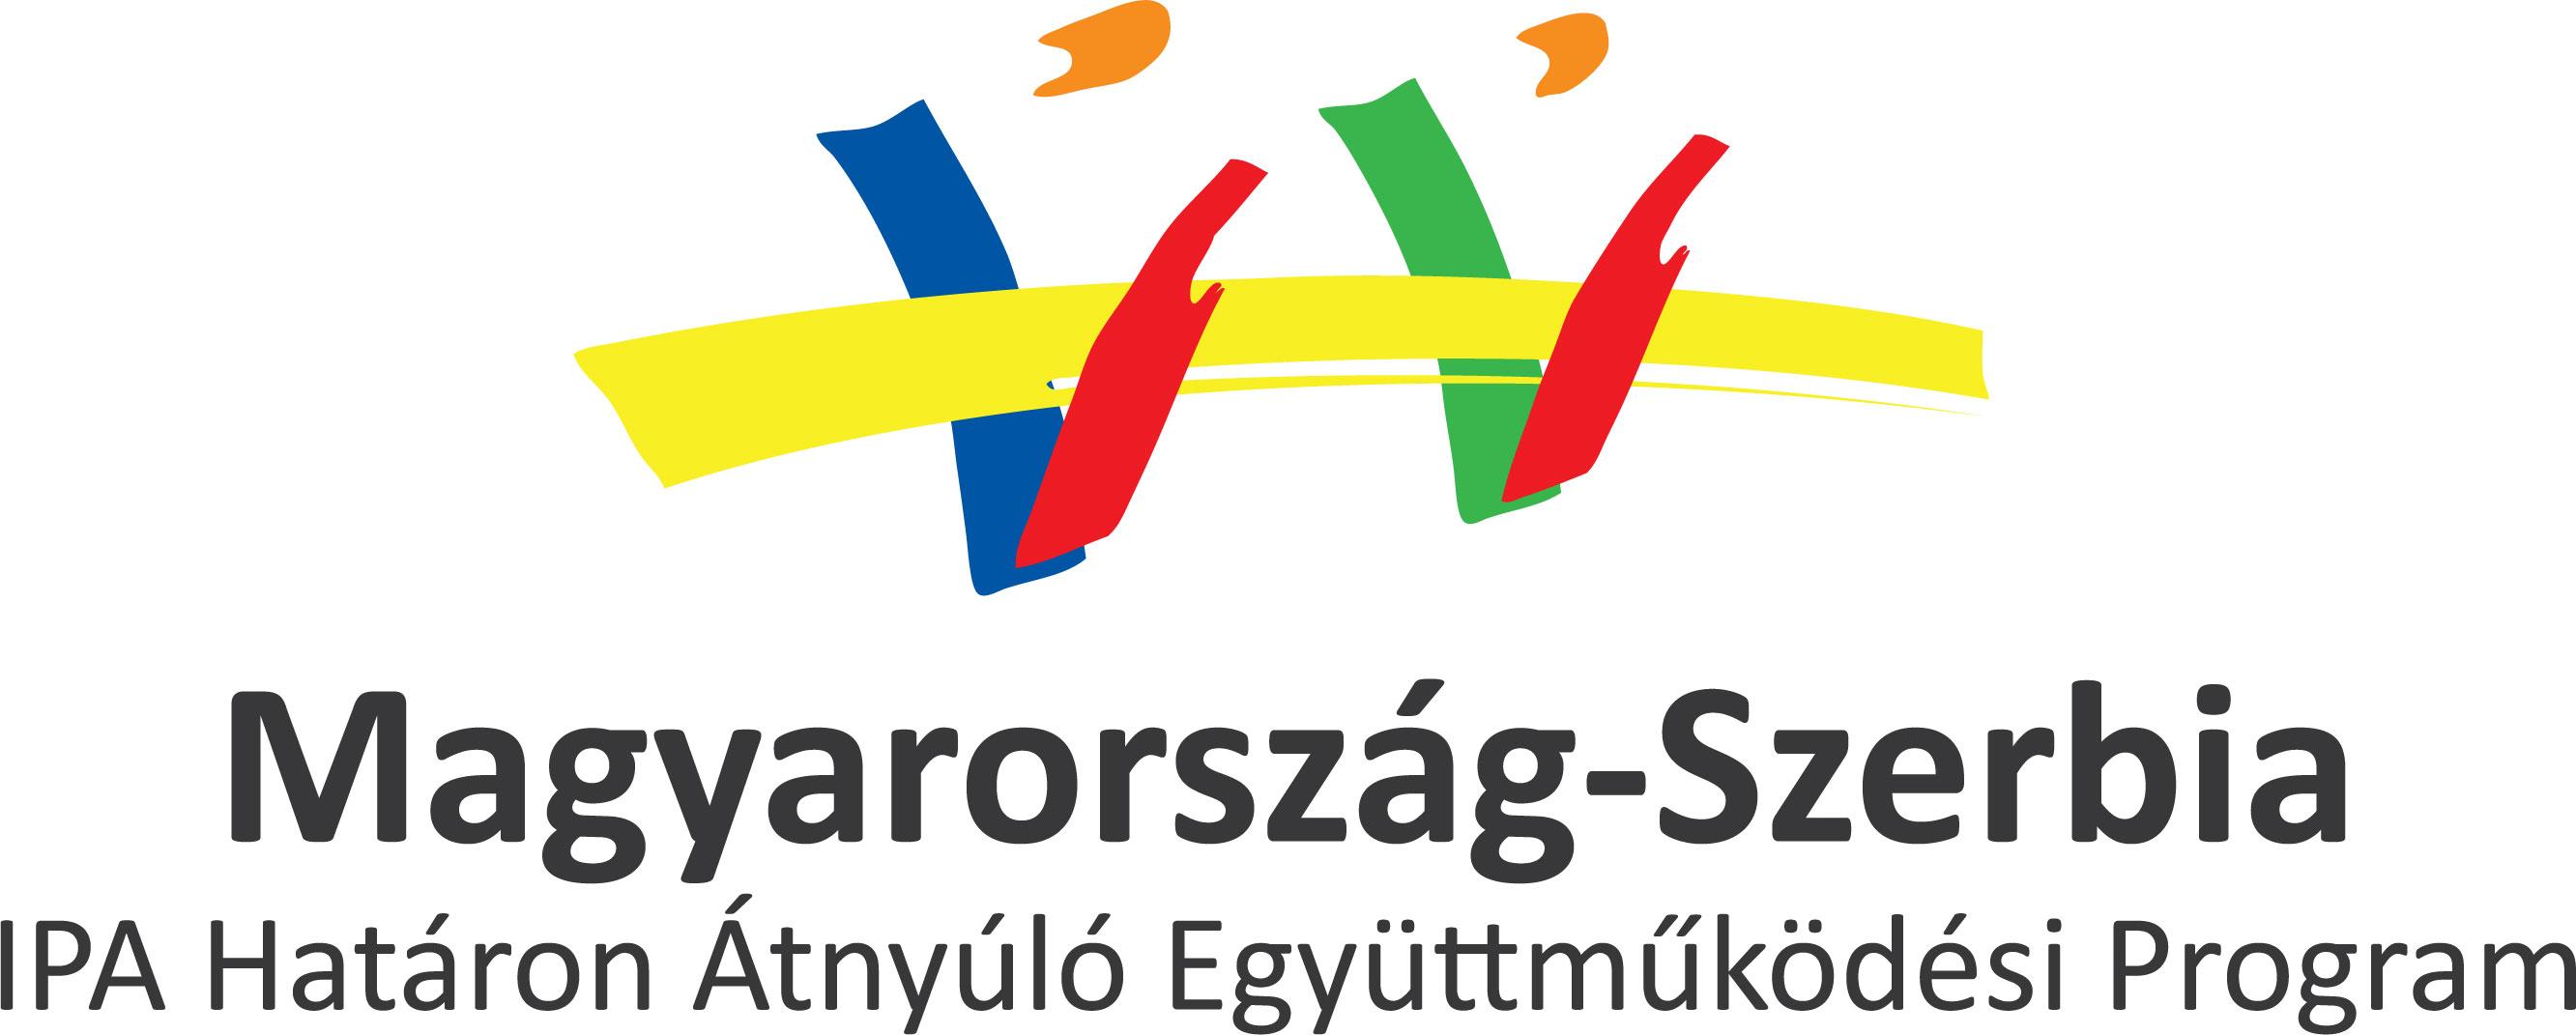 husrb_logo_hu_center